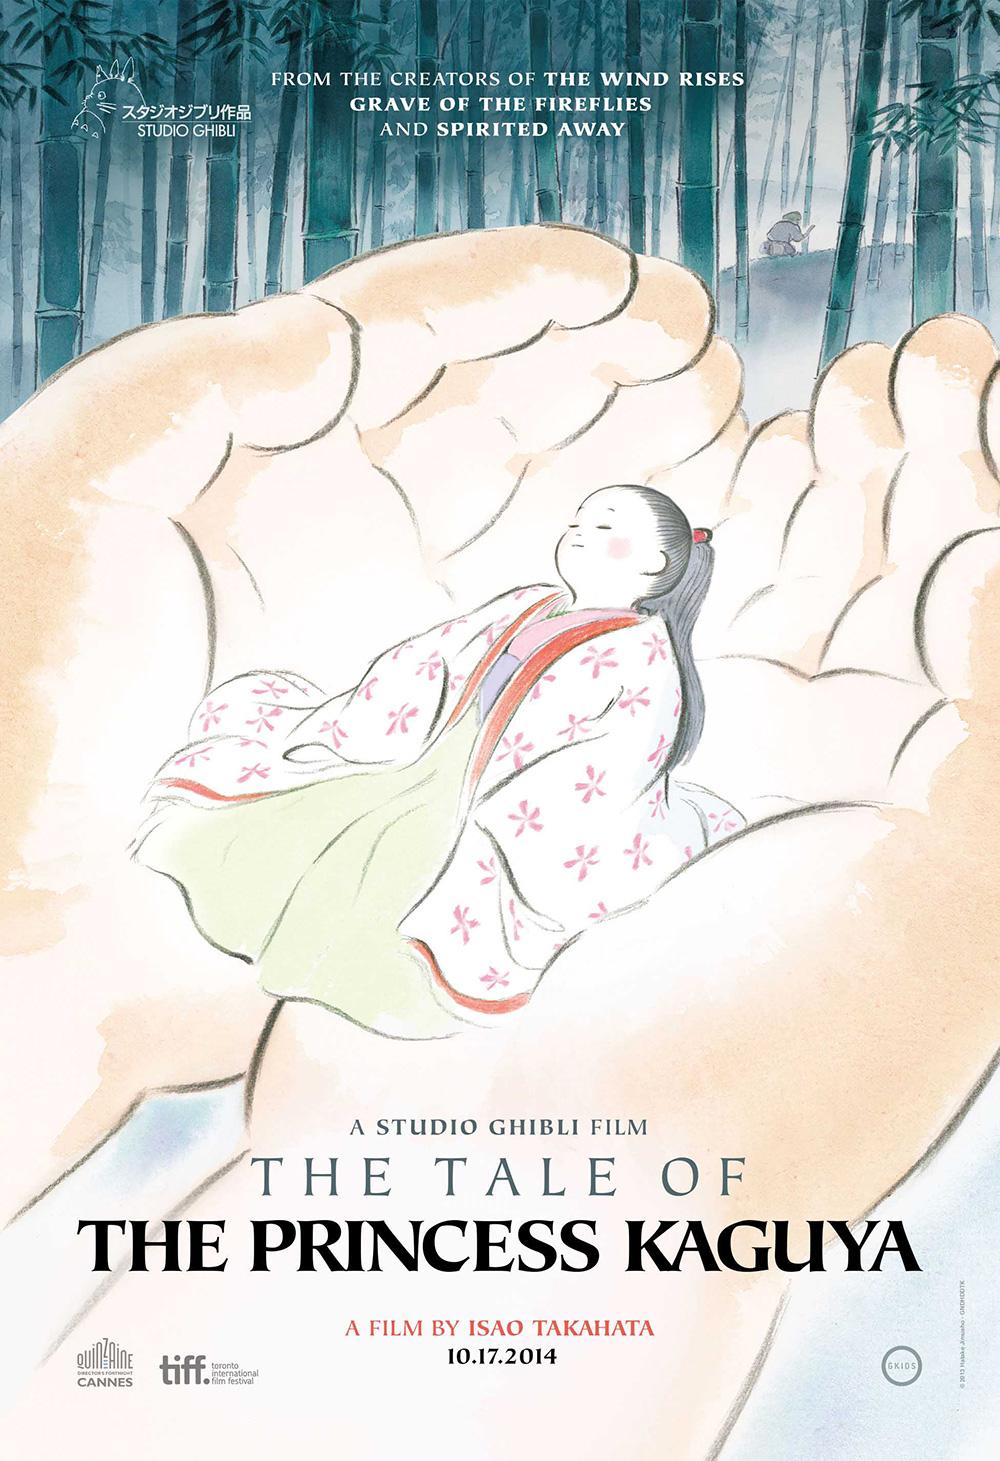 The-Tale-of-Princess-Kaguya-Movie-Poster